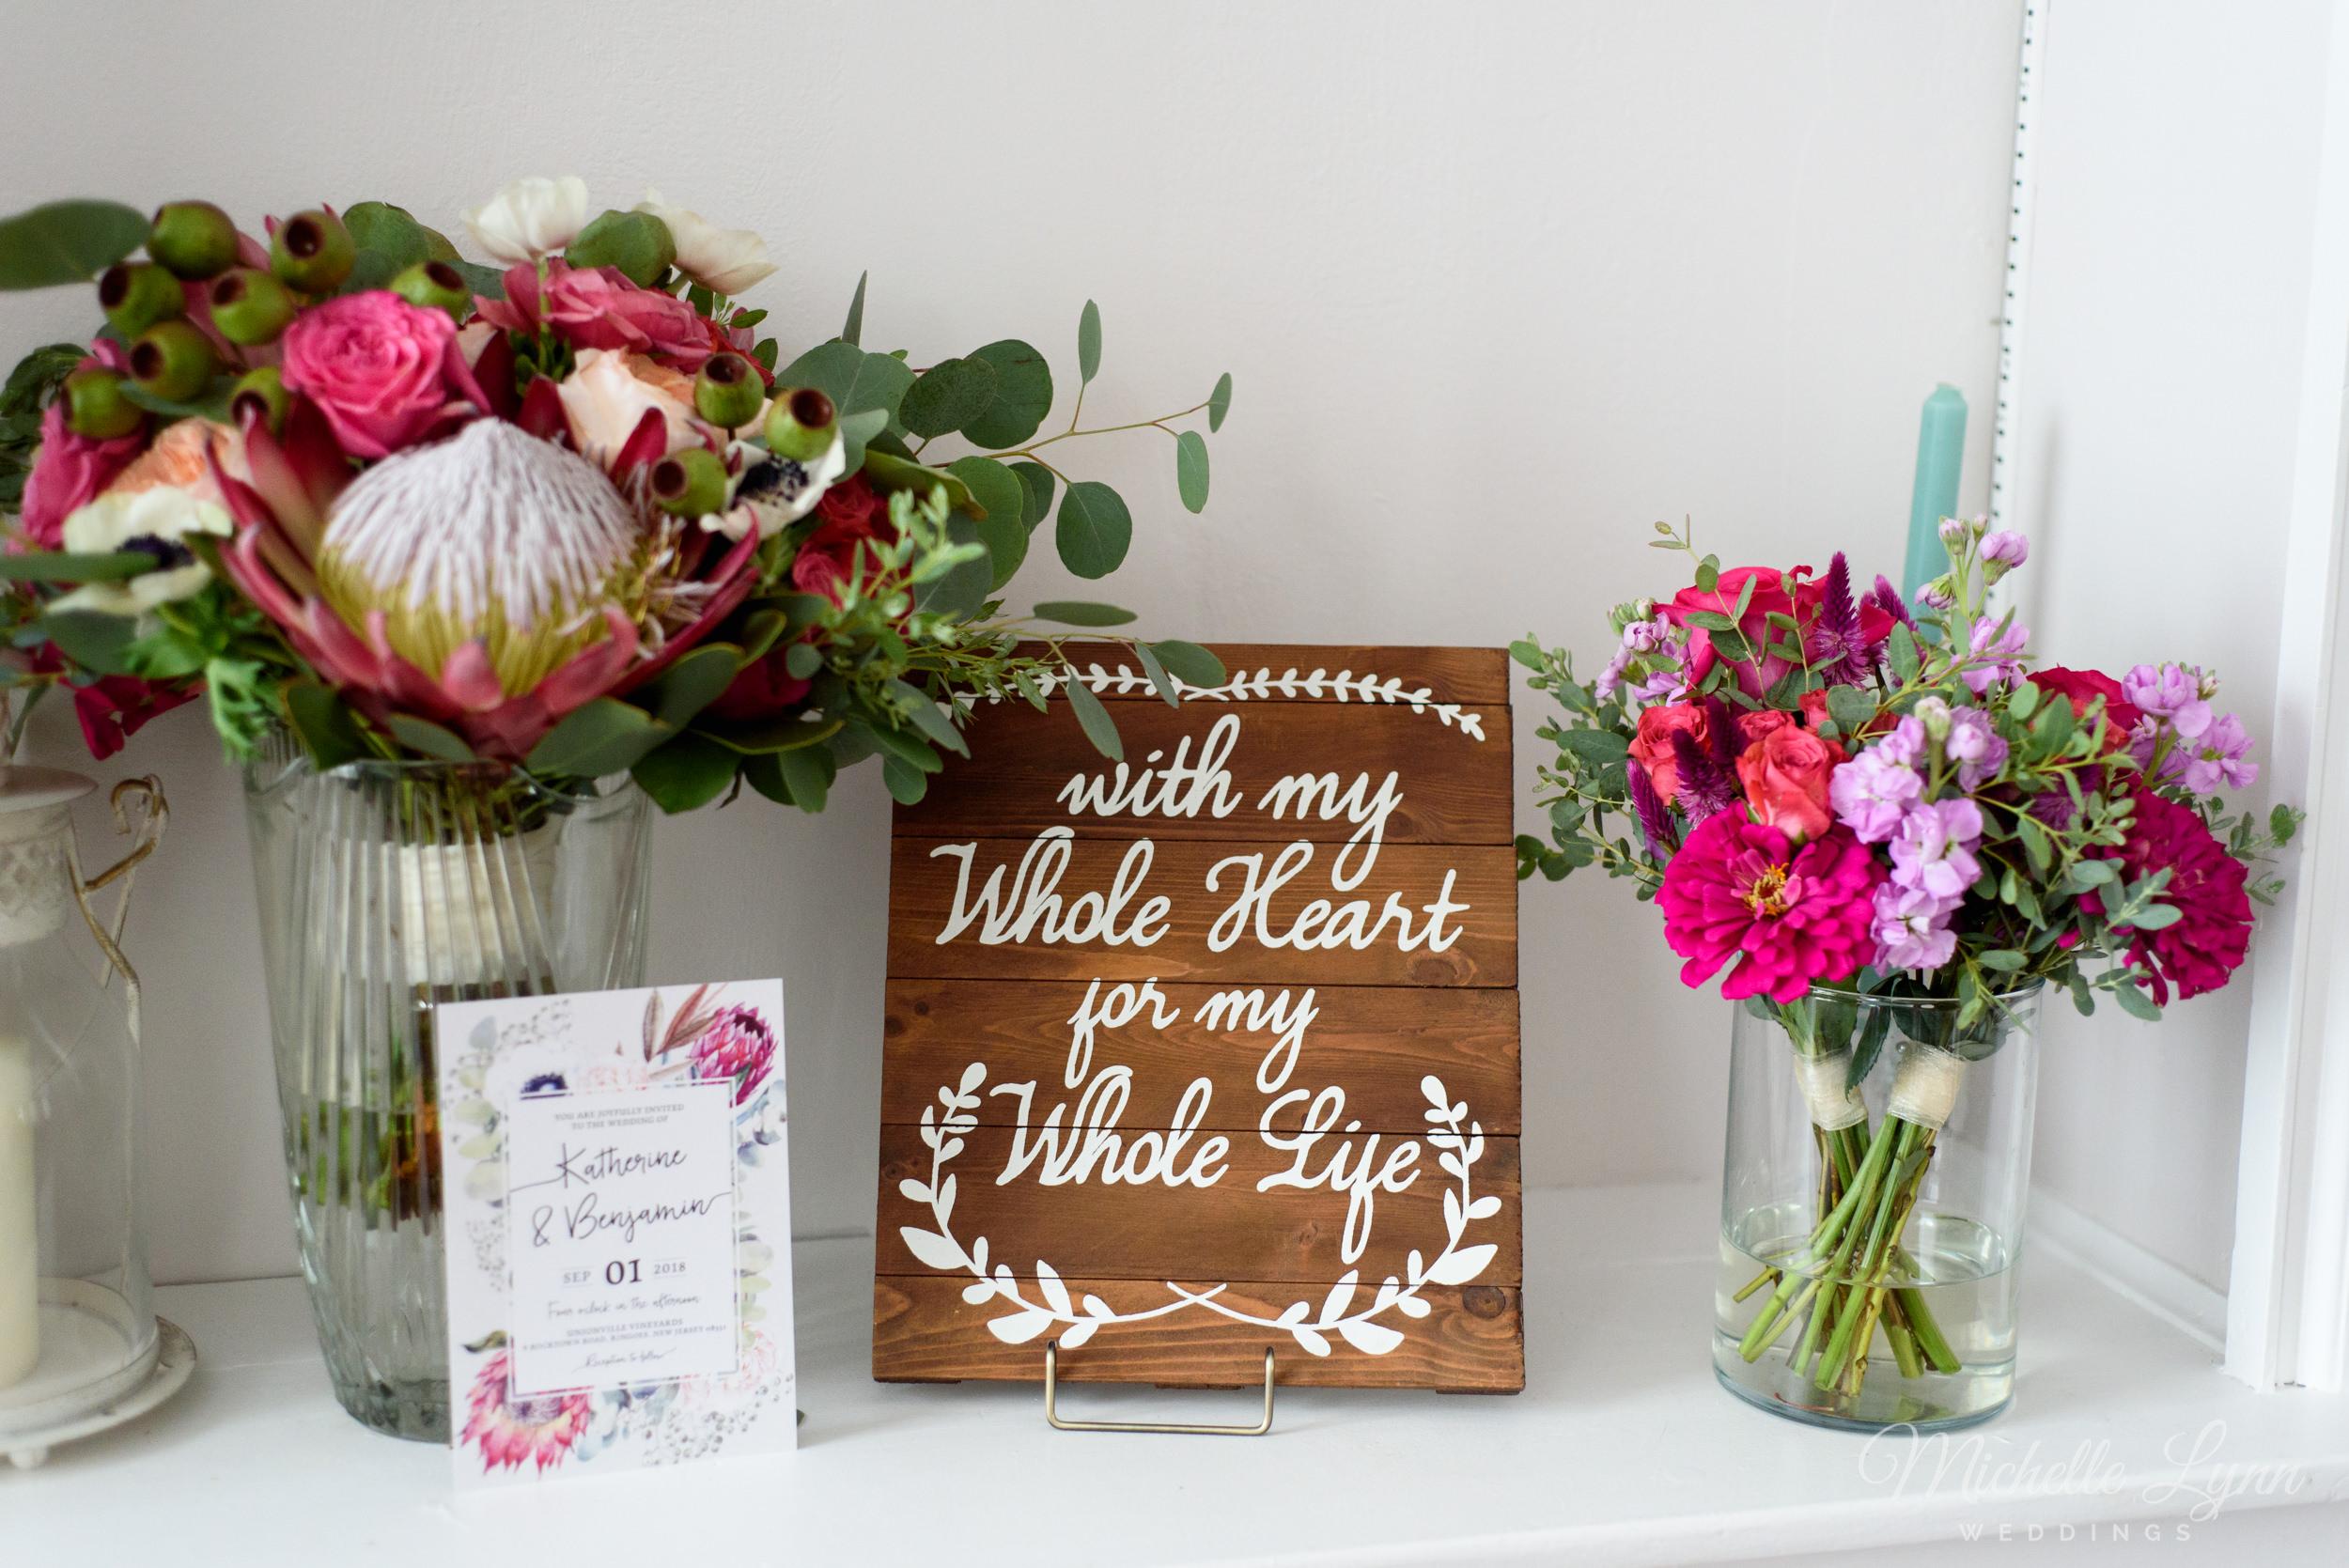 mlw-unionville-vineyards-nj-wedding-photography-6.jpg